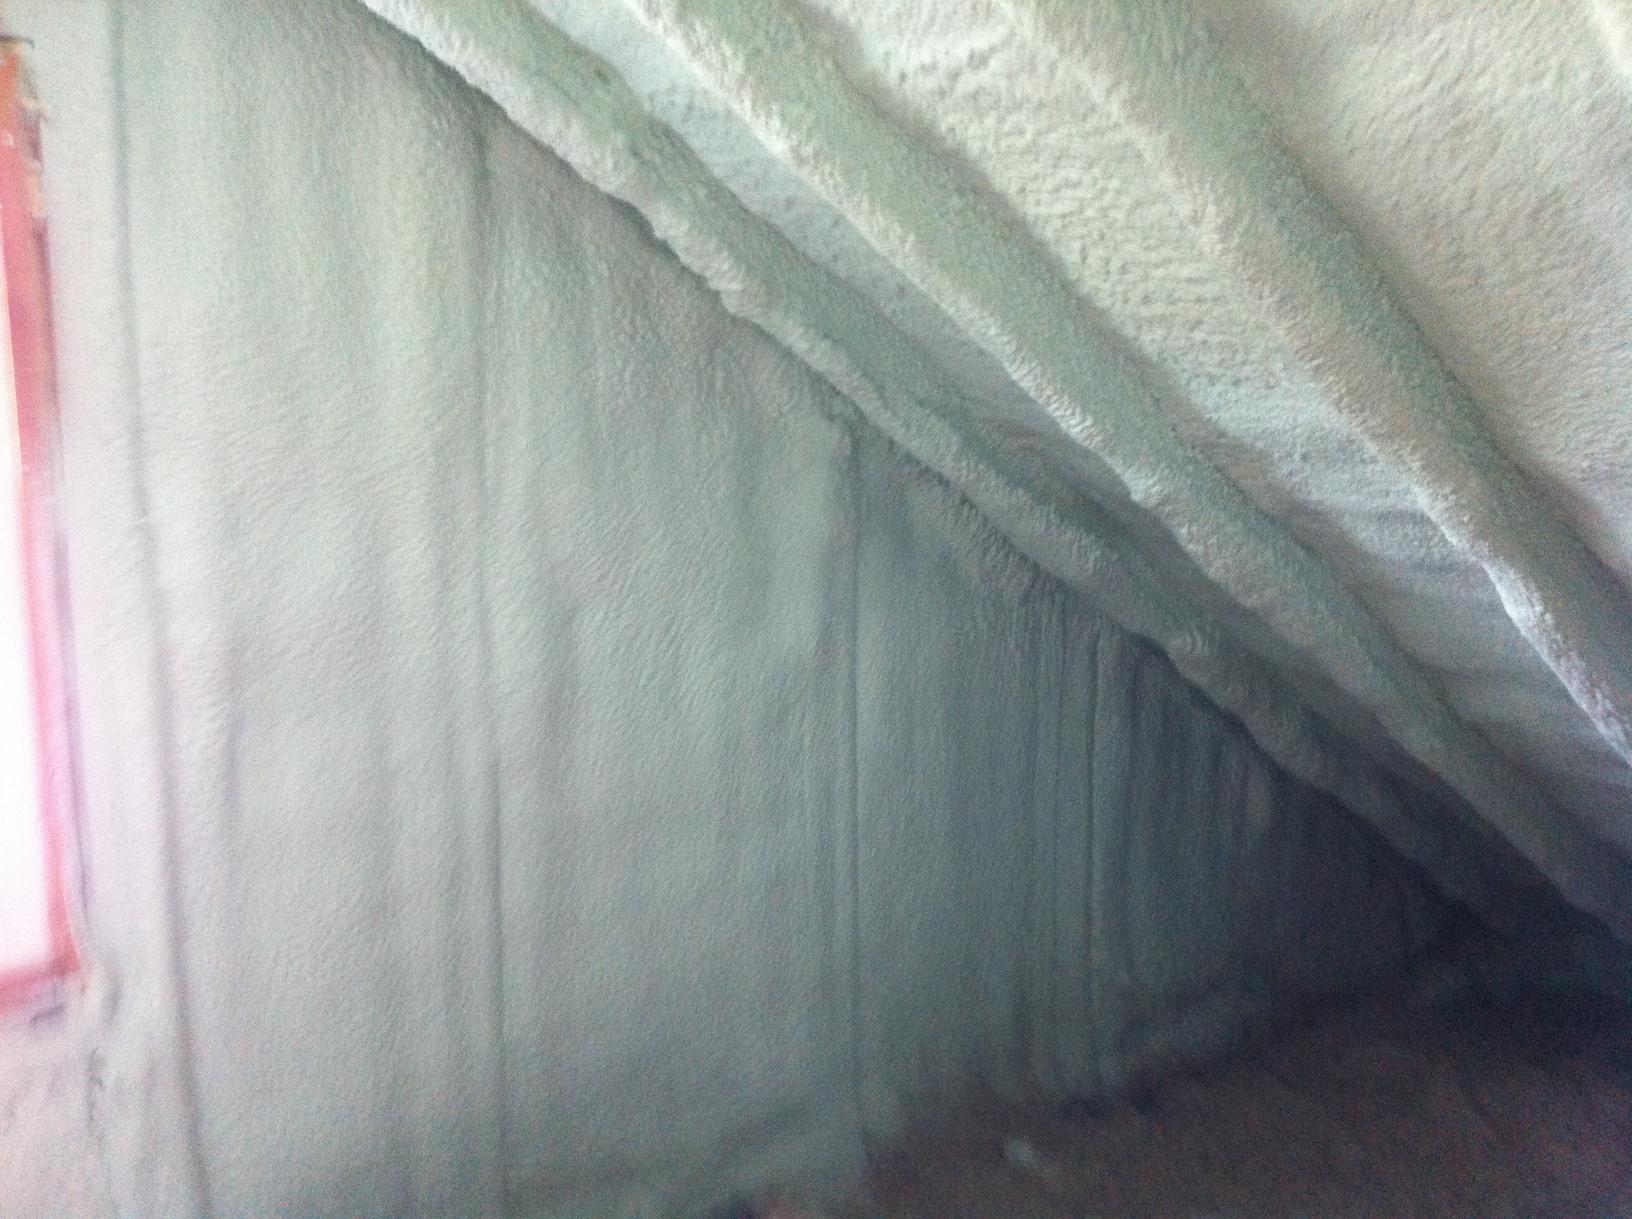 Spray Foam Insulated Attic